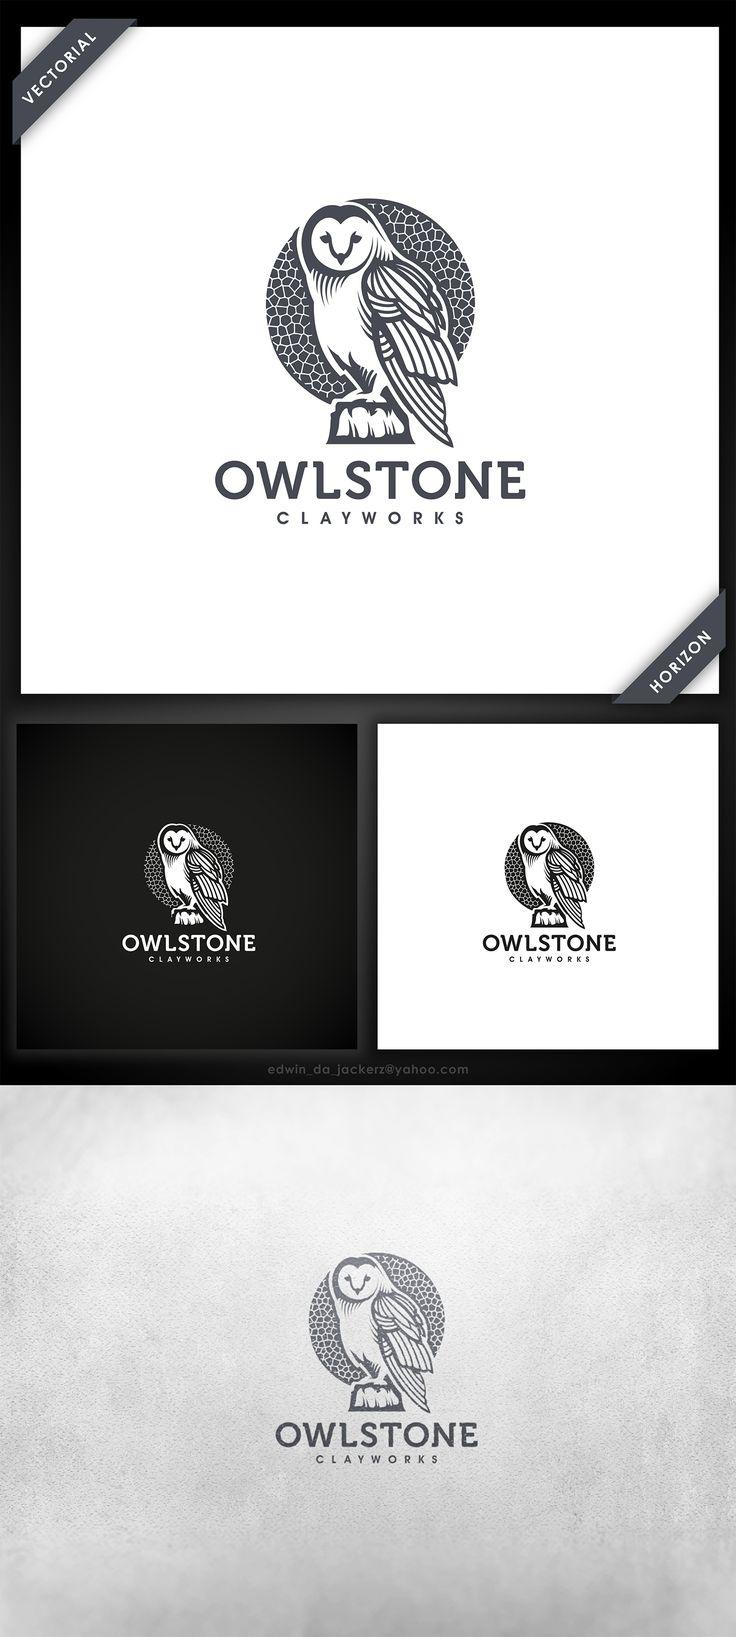 Tj initial luxury ornament monogram logo stock vector - Tiles Artisan Logo